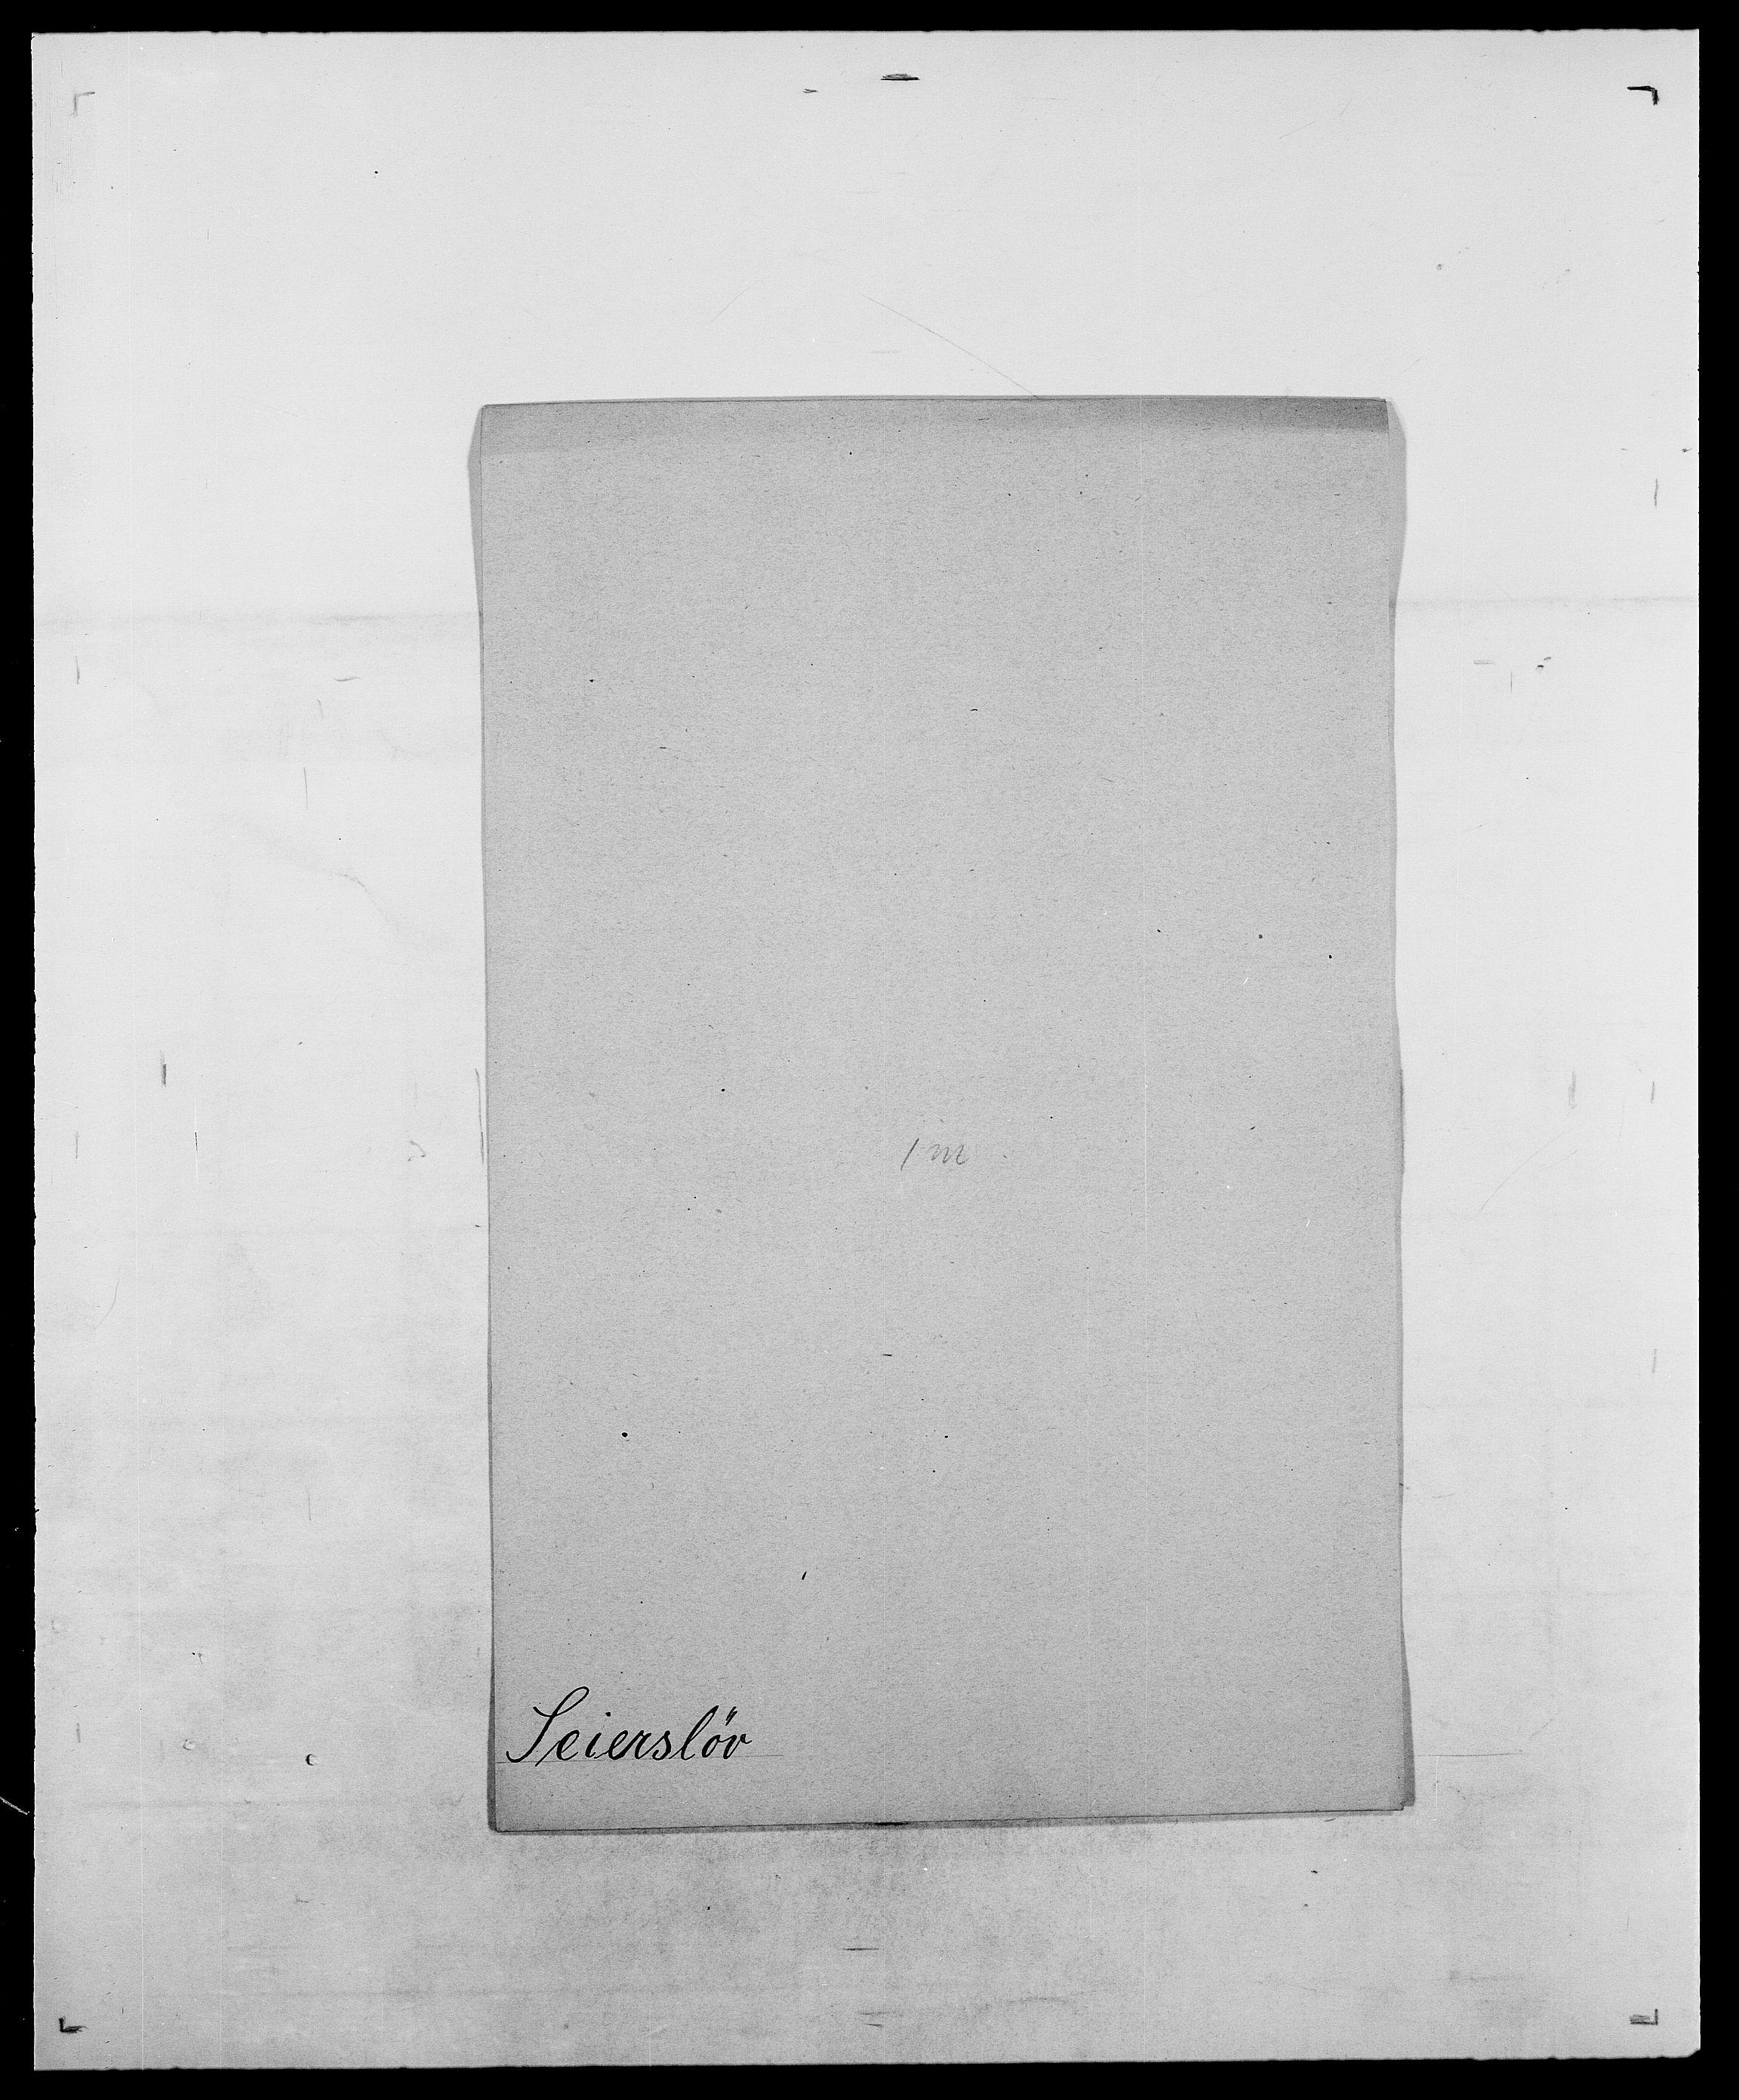 SAO, Delgobe, Charles Antoine - samling, D/Da/L0035: Schnabel - sjetman, s. 602